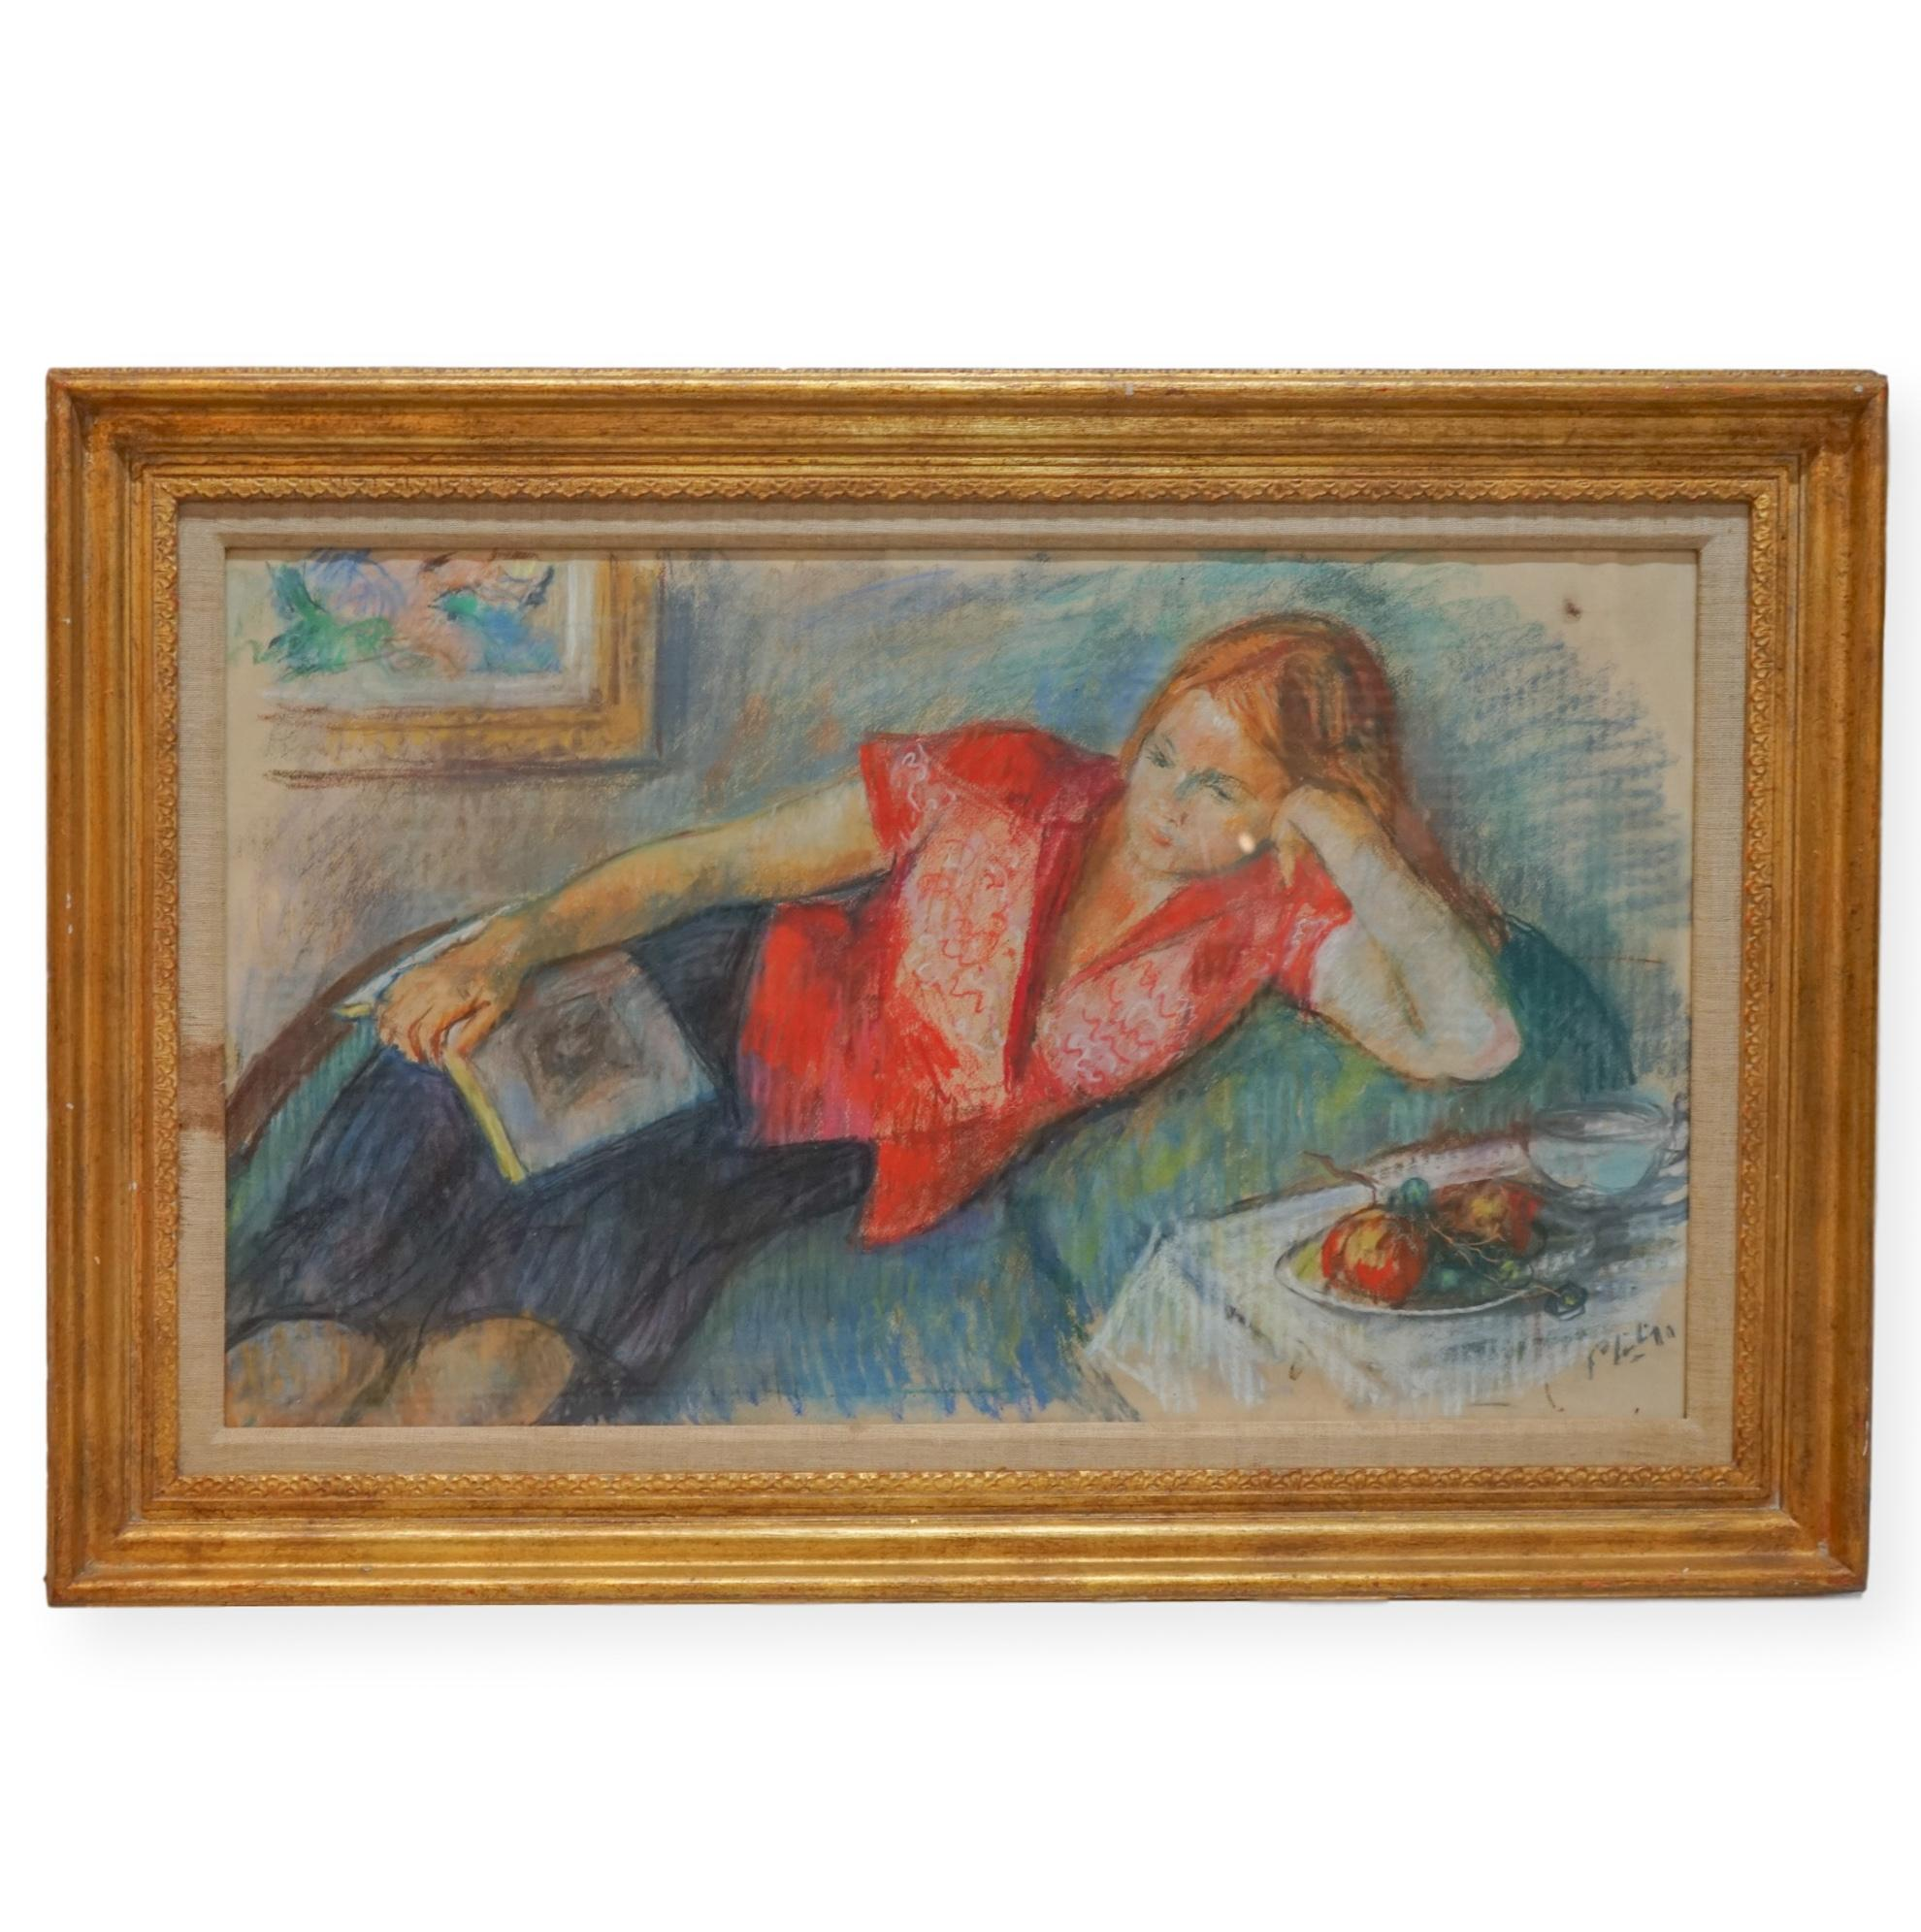 Modernist Portrait of a Reclining Pensive Girl